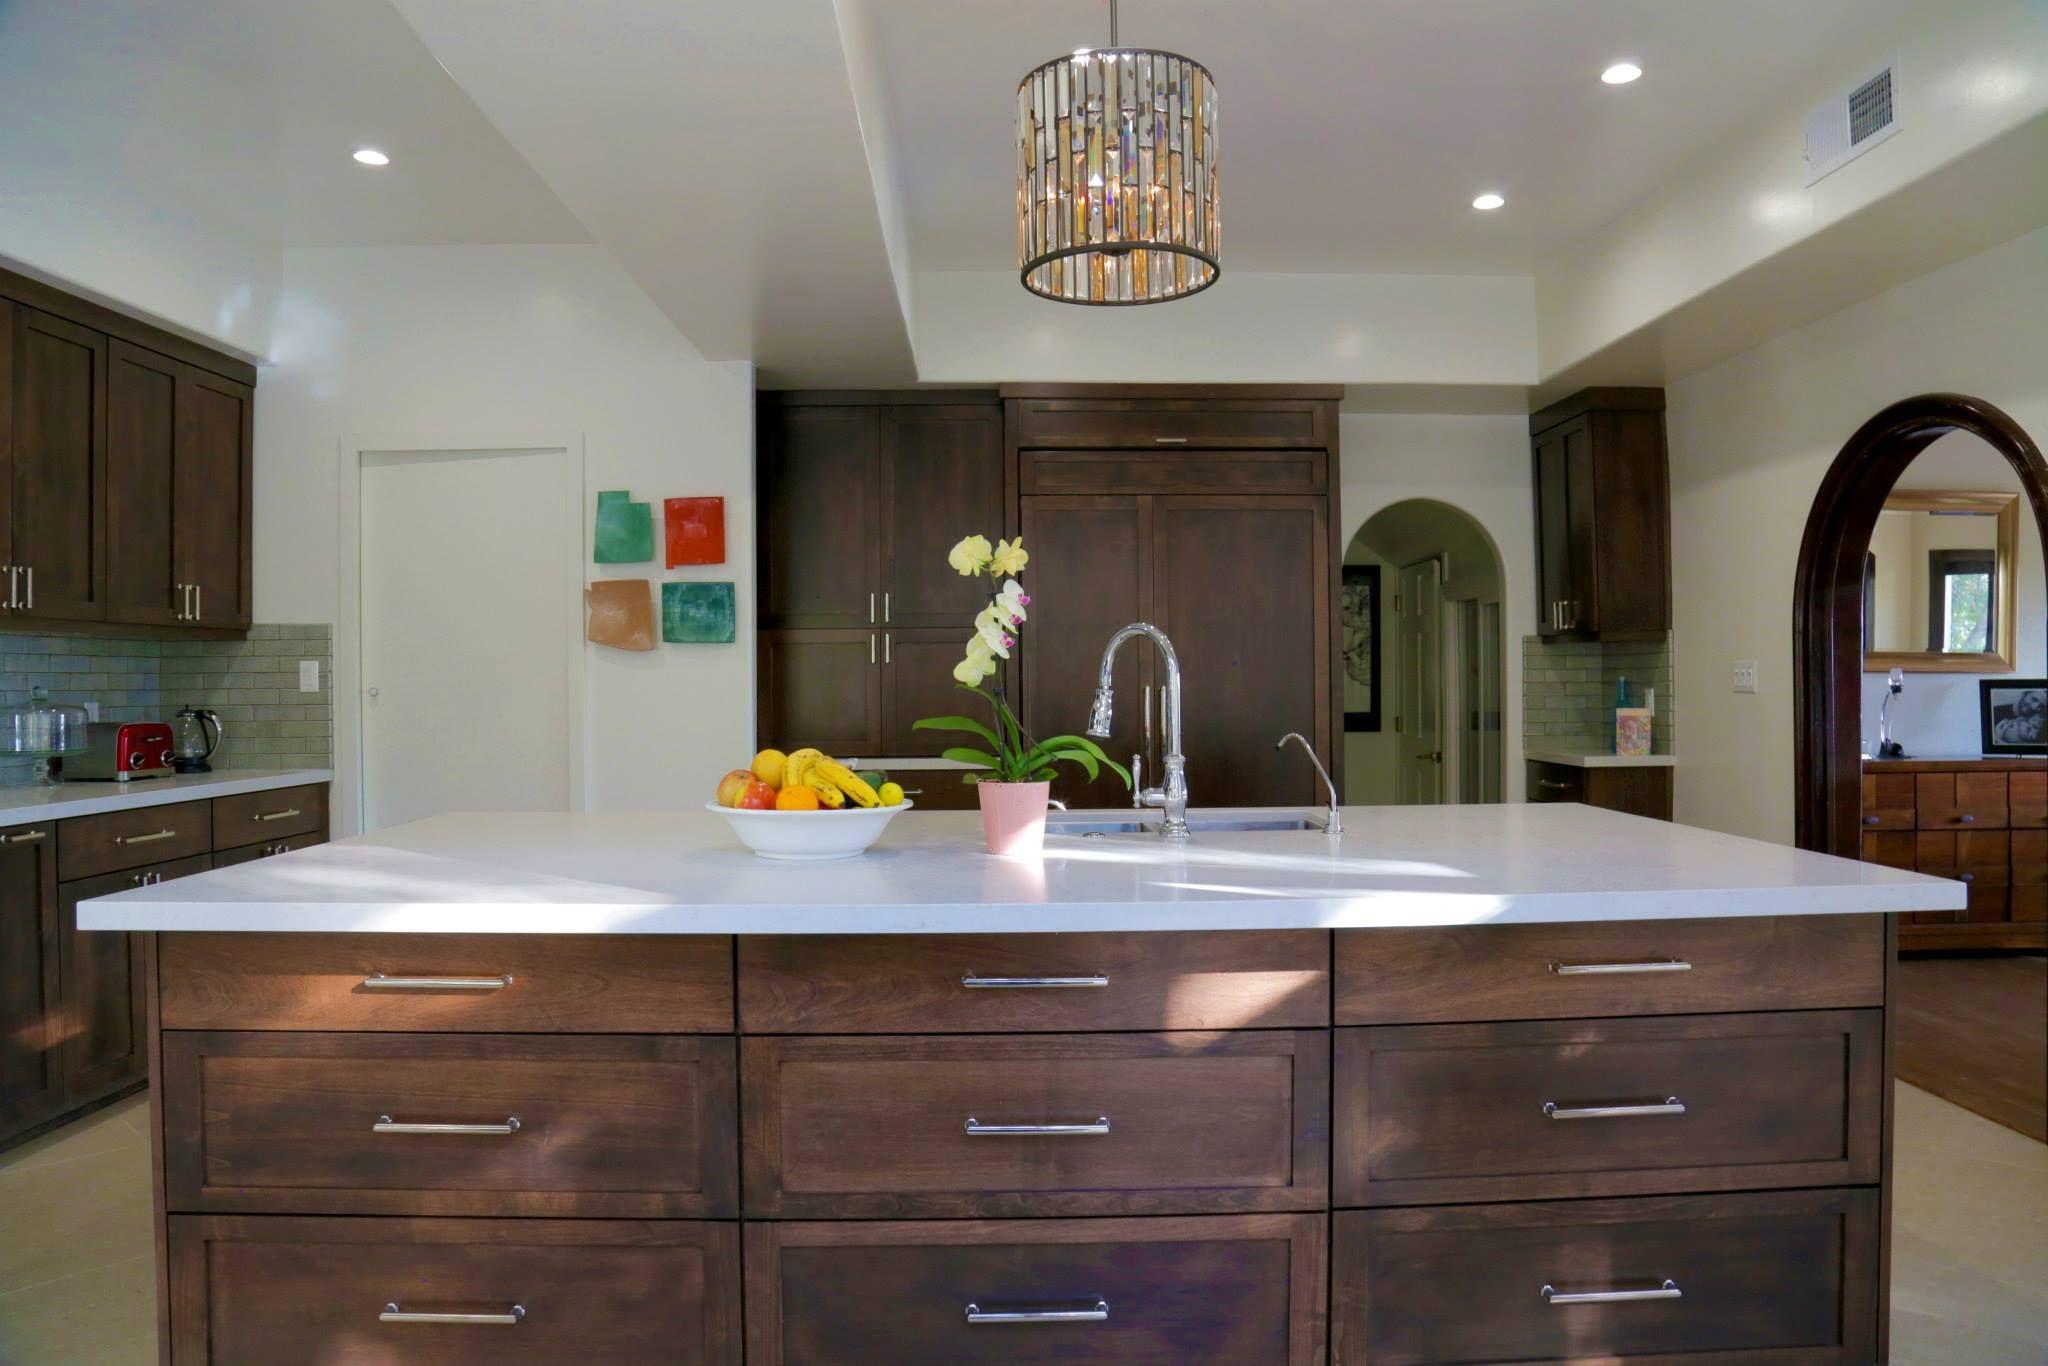 New Kitchen Cabinets Cost Estimator alkamedia